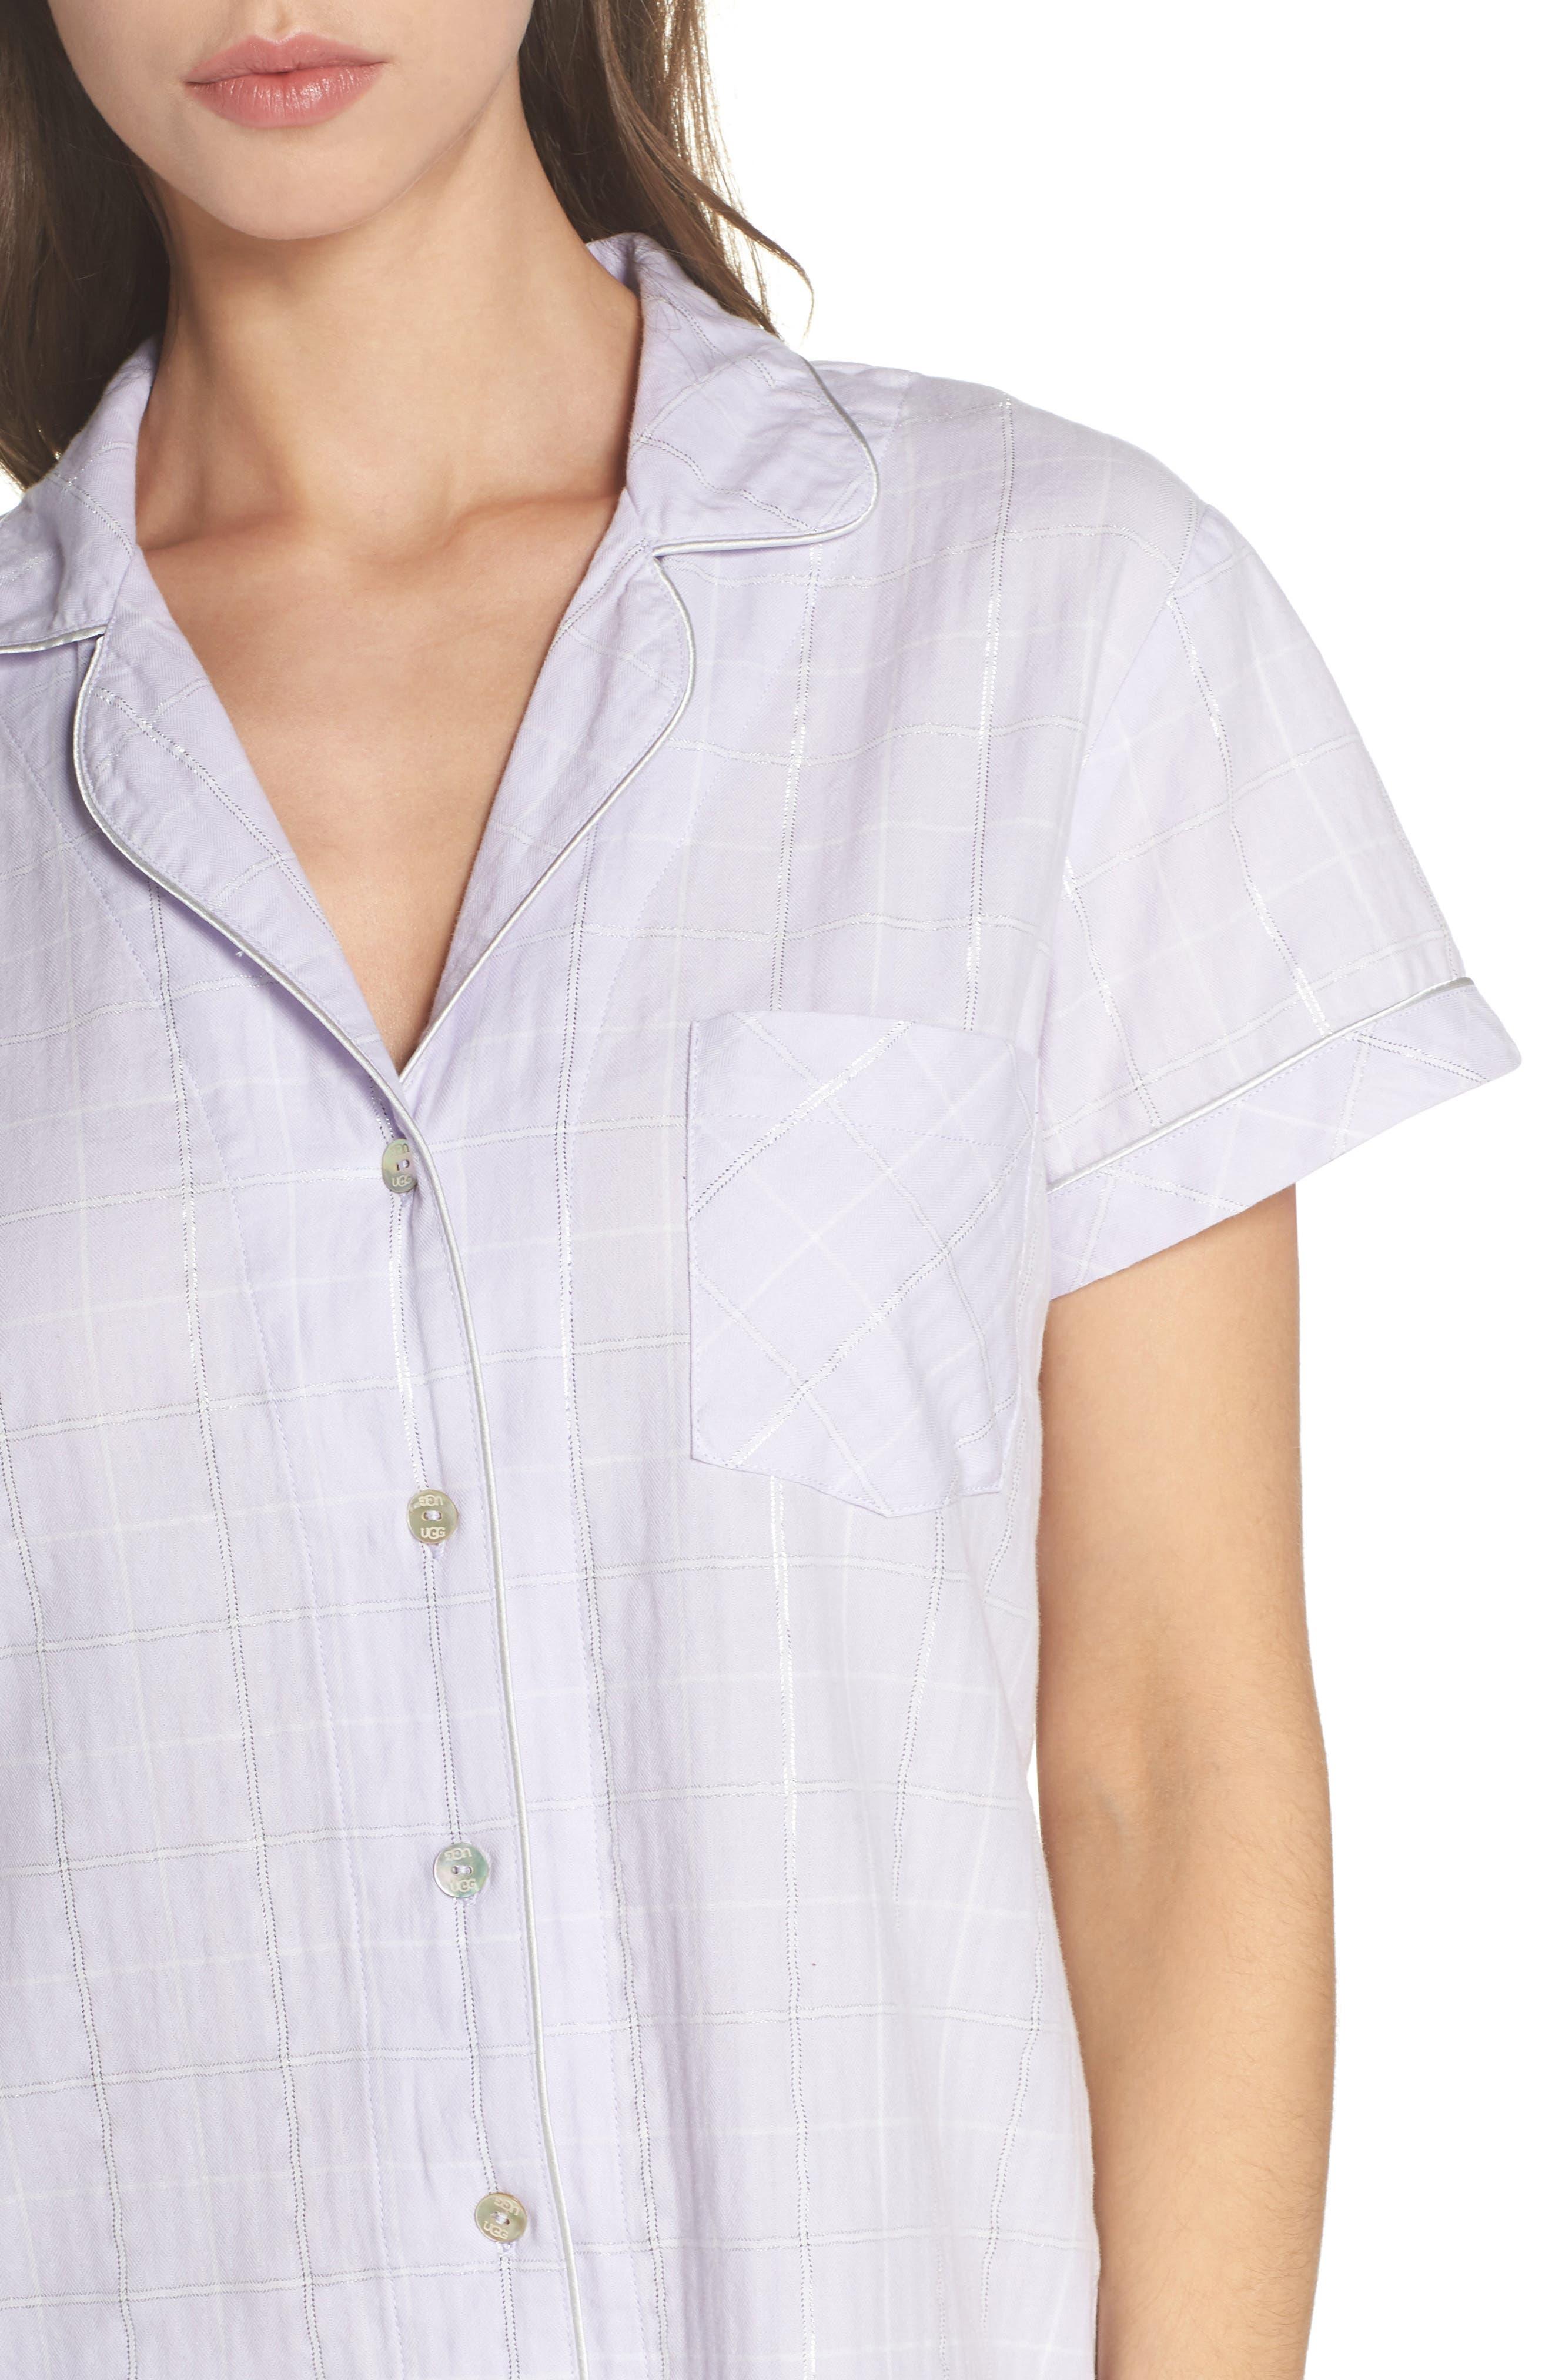 Rosan Sparkle Pajamas,                             Alternate thumbnail 4, color,                             538